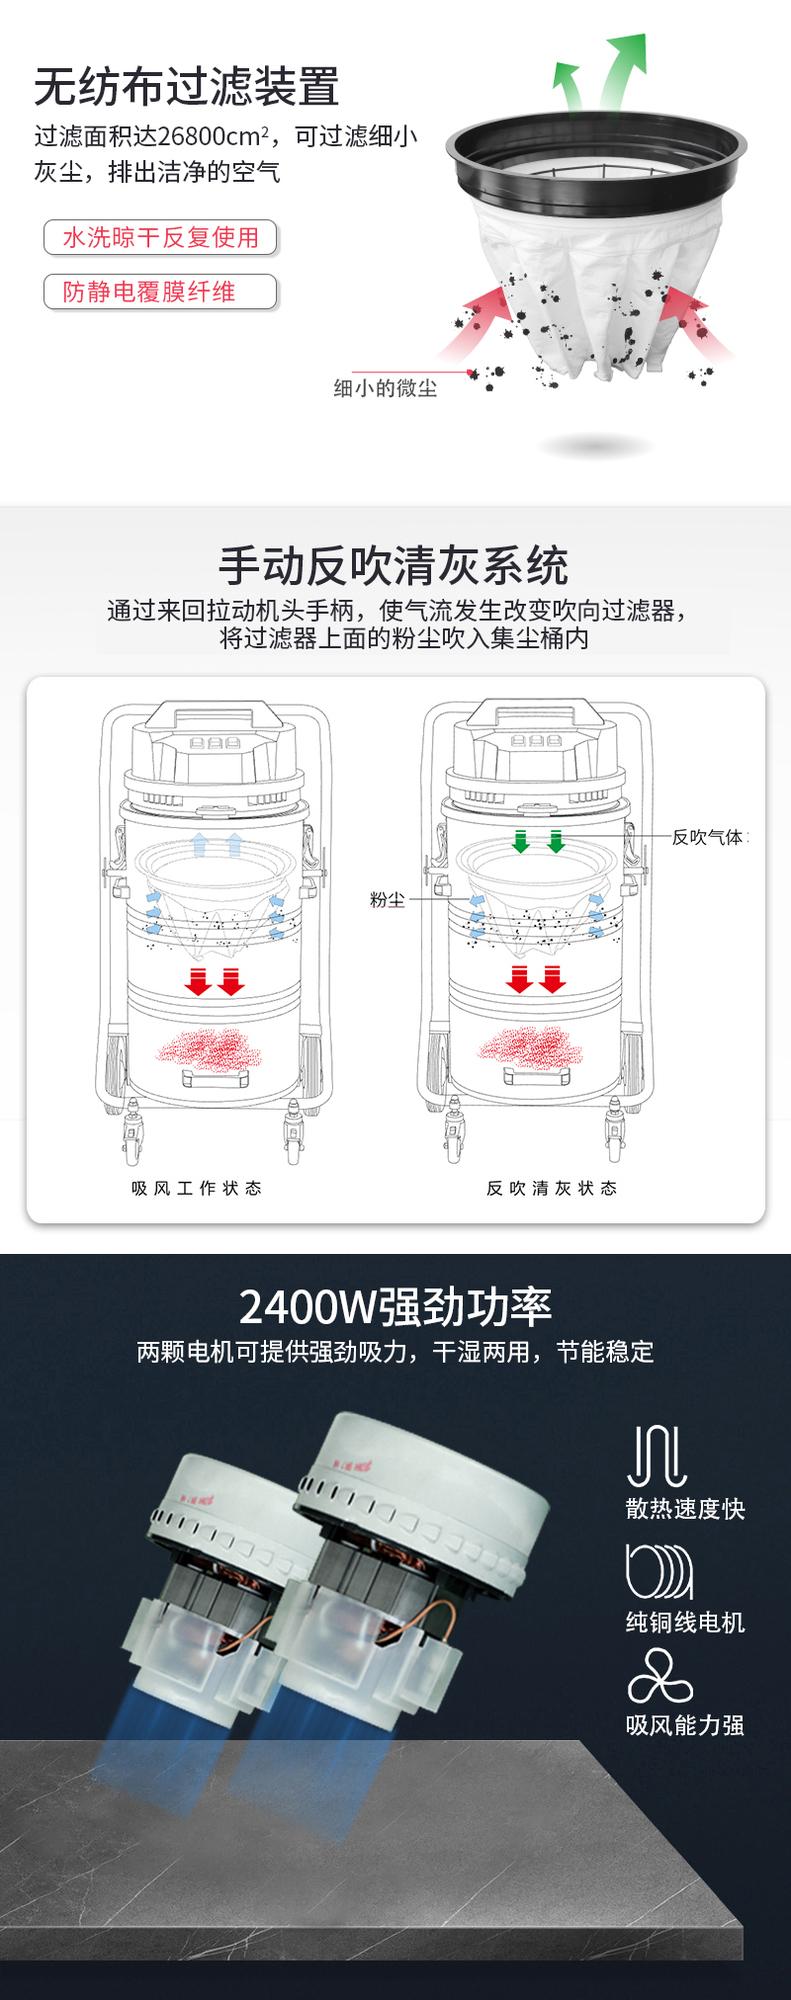 220v大功率生产厂家滤芯